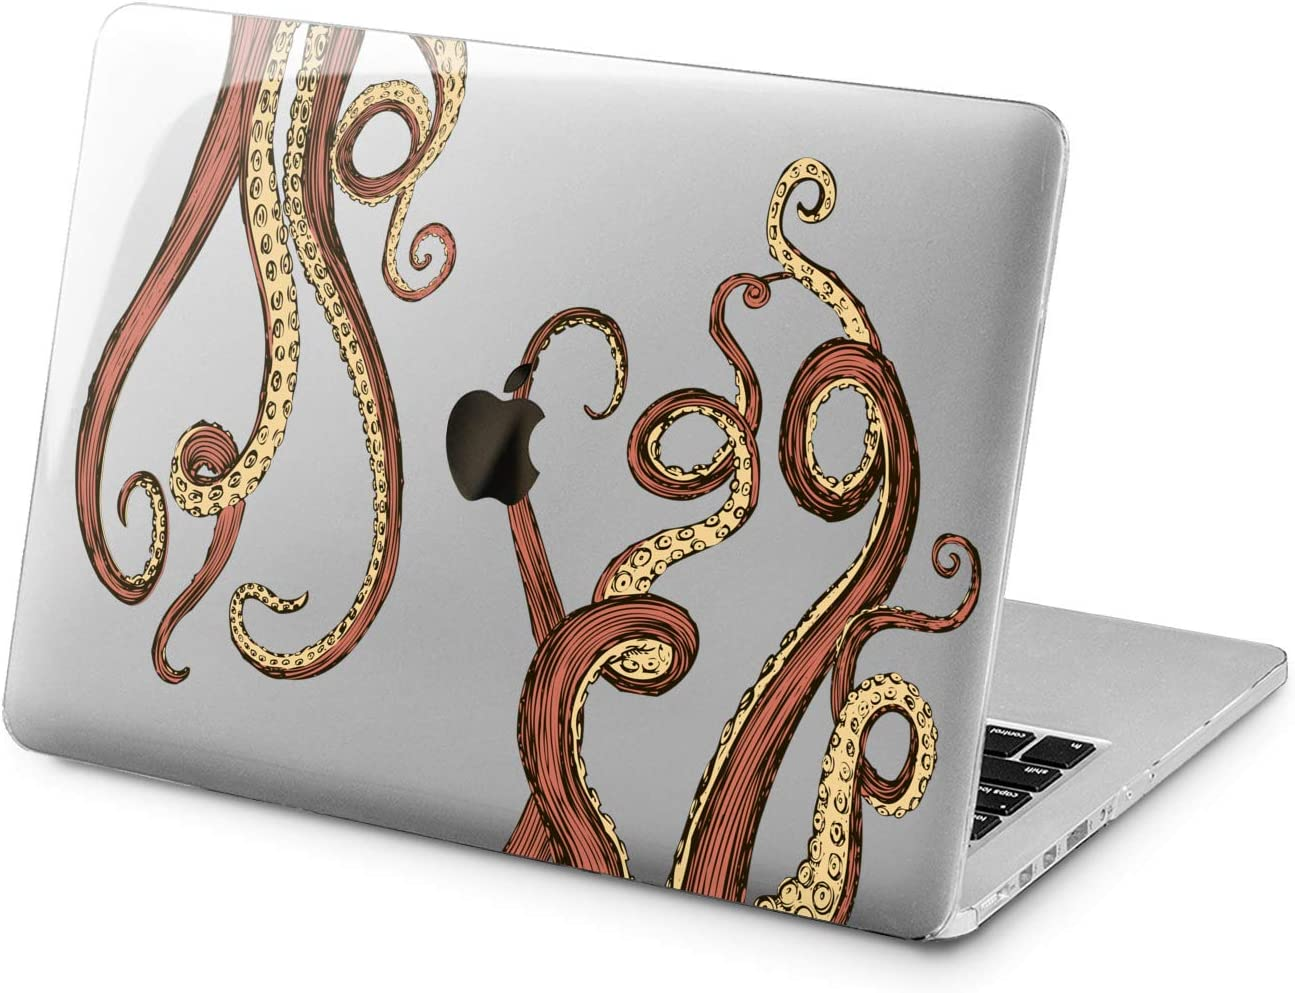 "Cavka Hard Shell Case for Apple MacBook Pro 13"" 2019 15"" 2018 Air 13"" 2020 Retina 2015 Mac 11"" Mac 12"" Laptop Print Plastic Cover Design Octopus Ocean Fun Tentacles Protective Animal Beautiful Cute"